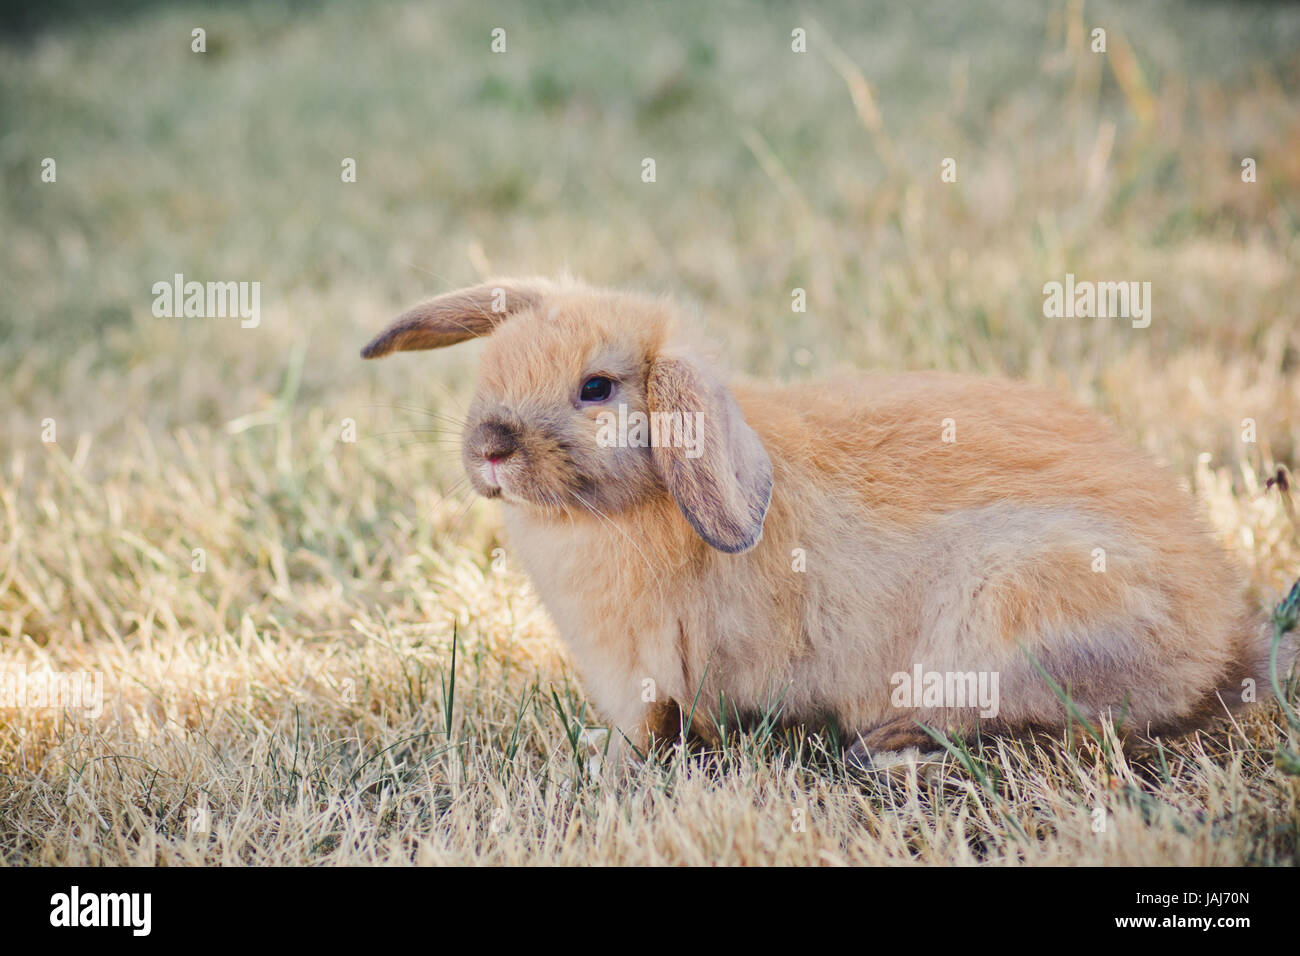 Tan Holland Lop Bunny - Stock Image